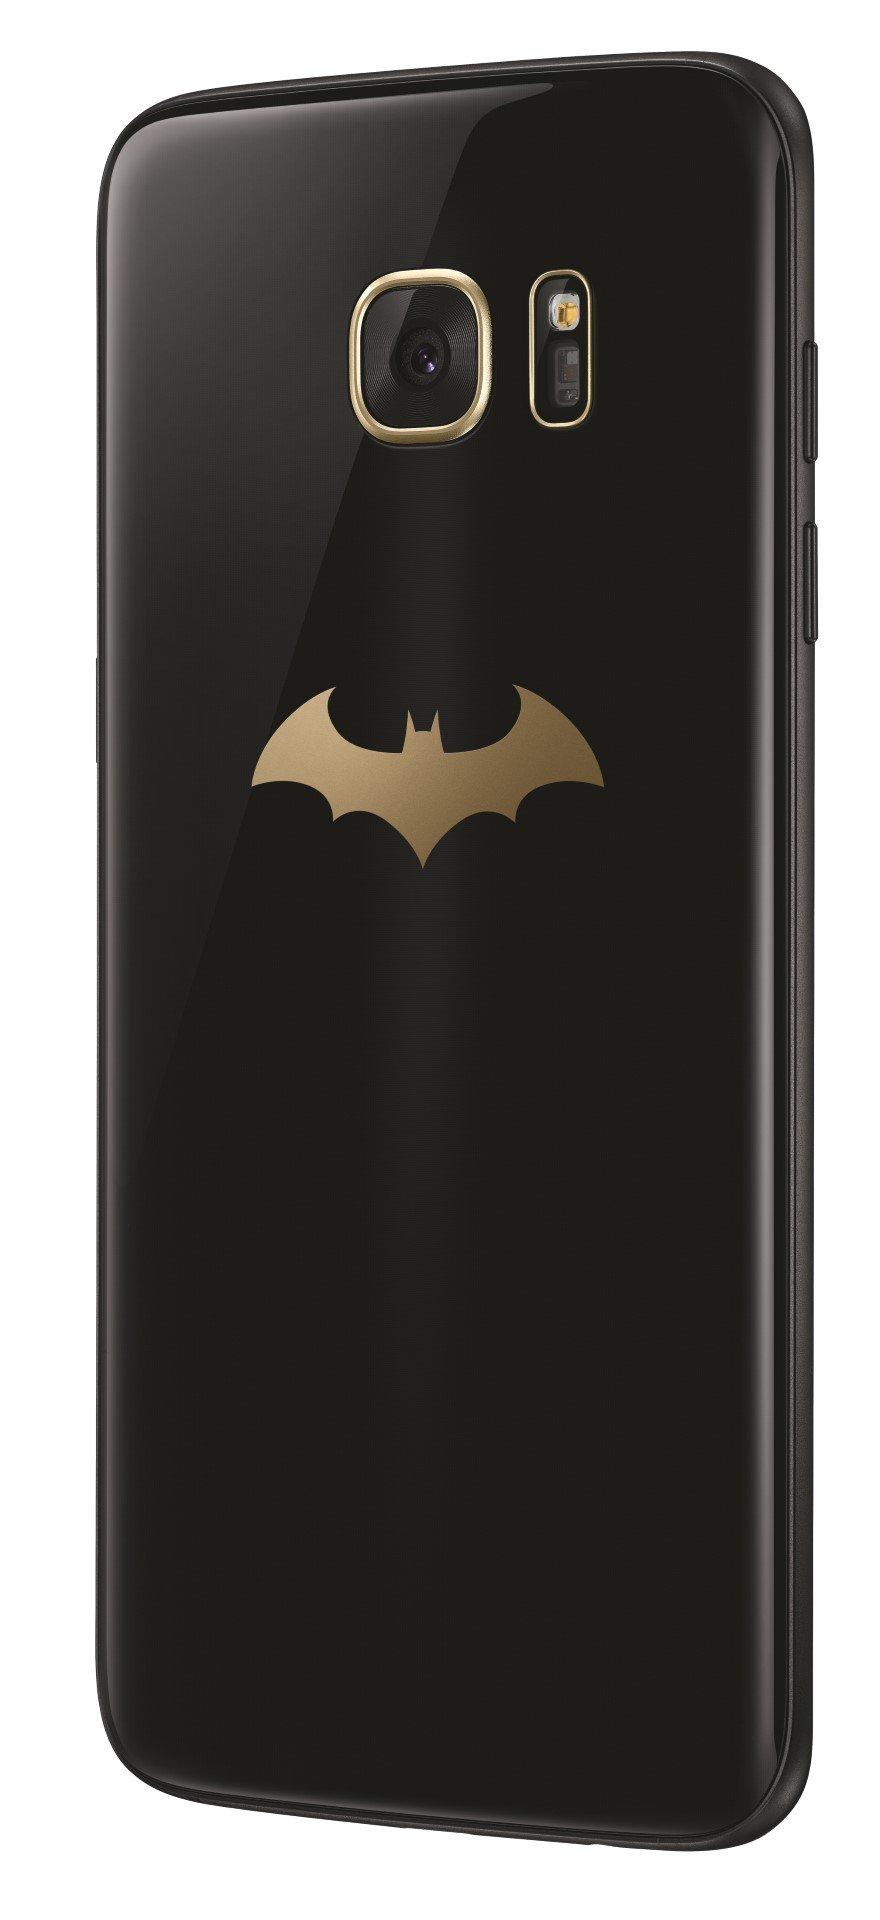 Samsung Galaxy S7 Edge - Batman Edition soll kommen 3